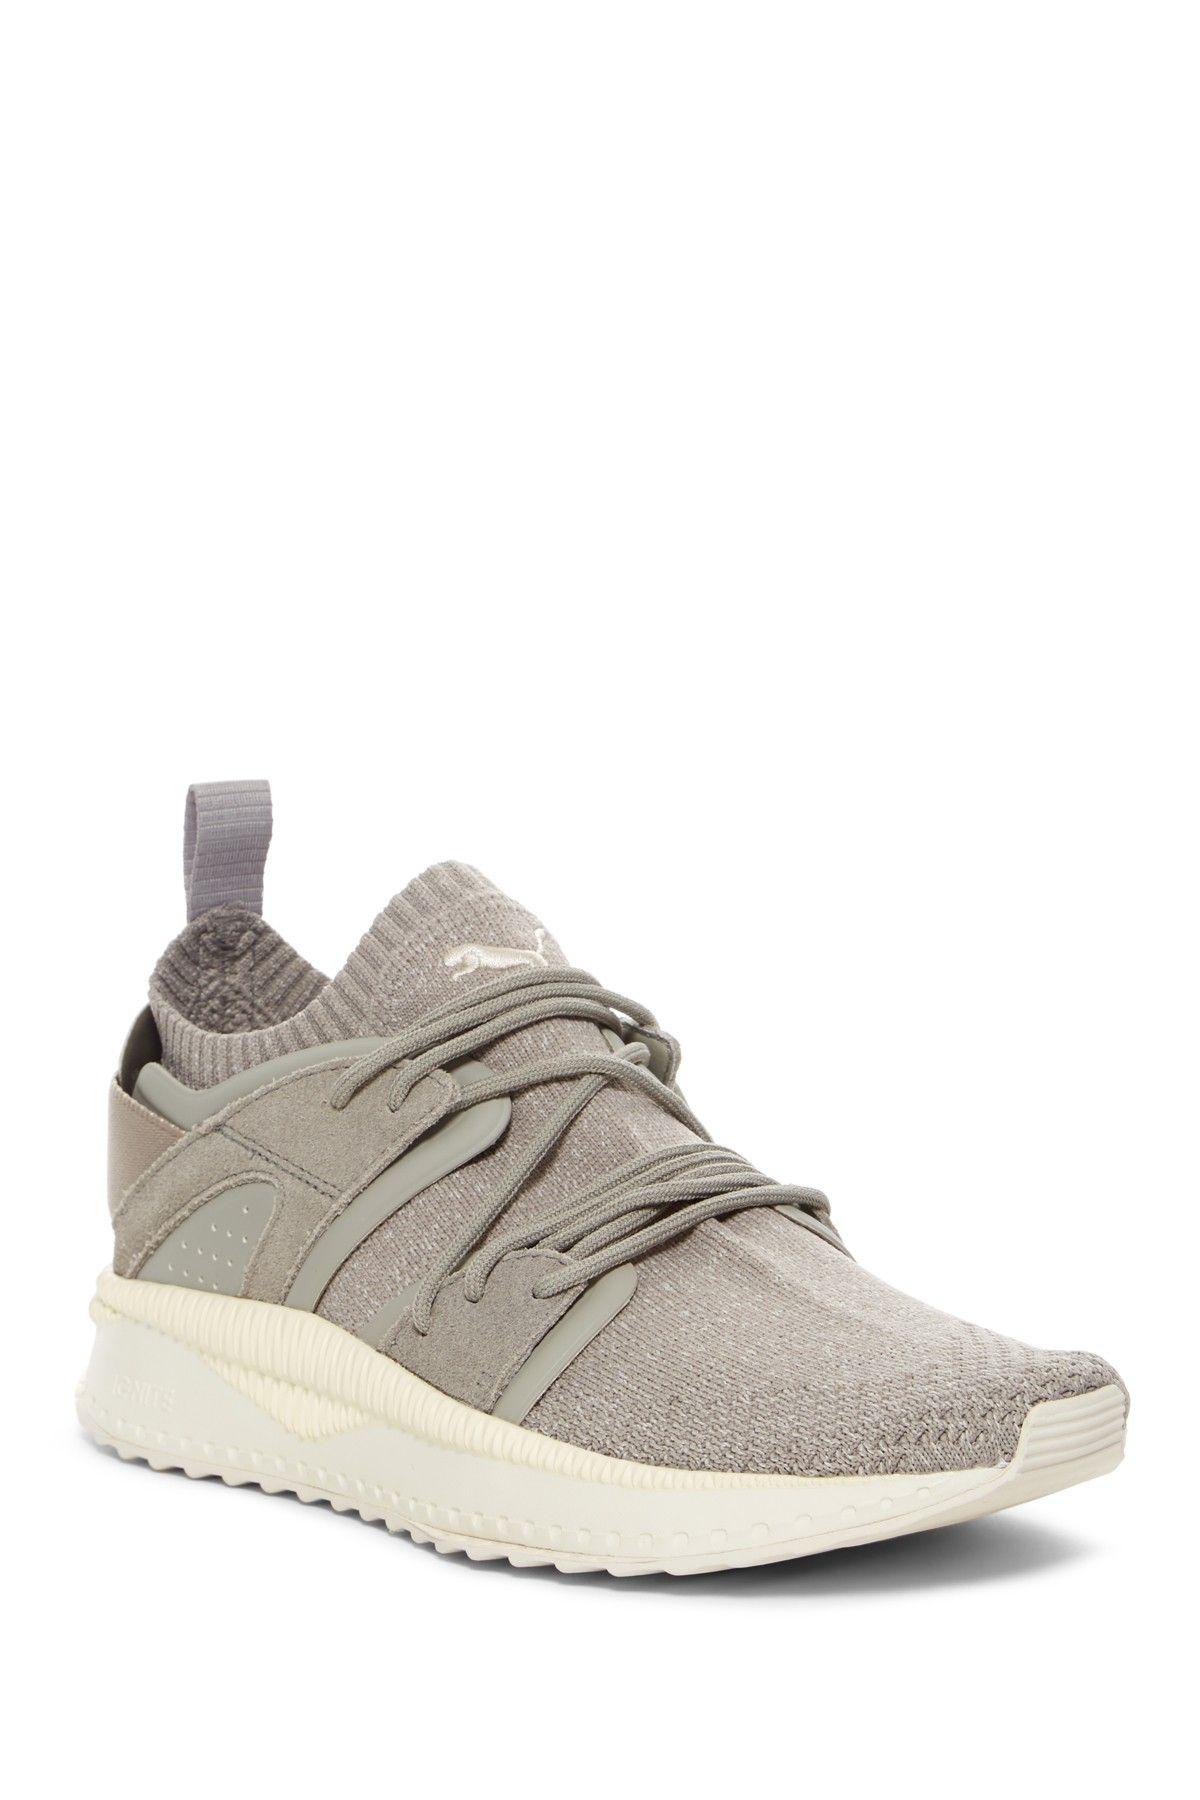 Puma Tsugi Blaze Evoknit Sneaker   Sneakers, Adidas sneakers